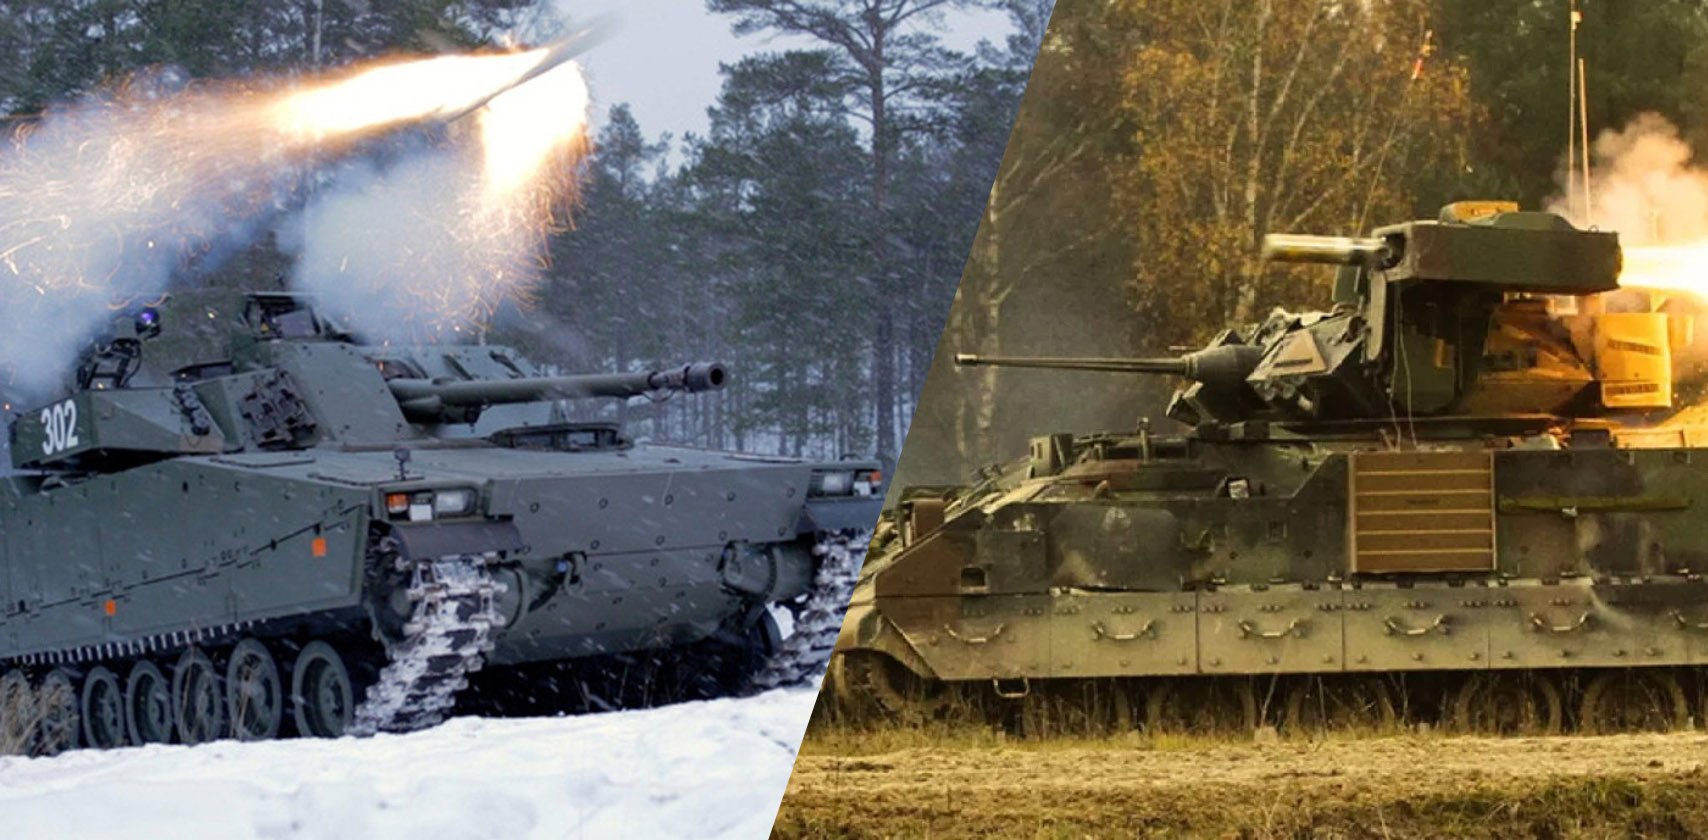 Turkey Defense Industry Projects - Page 2 IFV-ATGM-CV-90-M2-Bradley